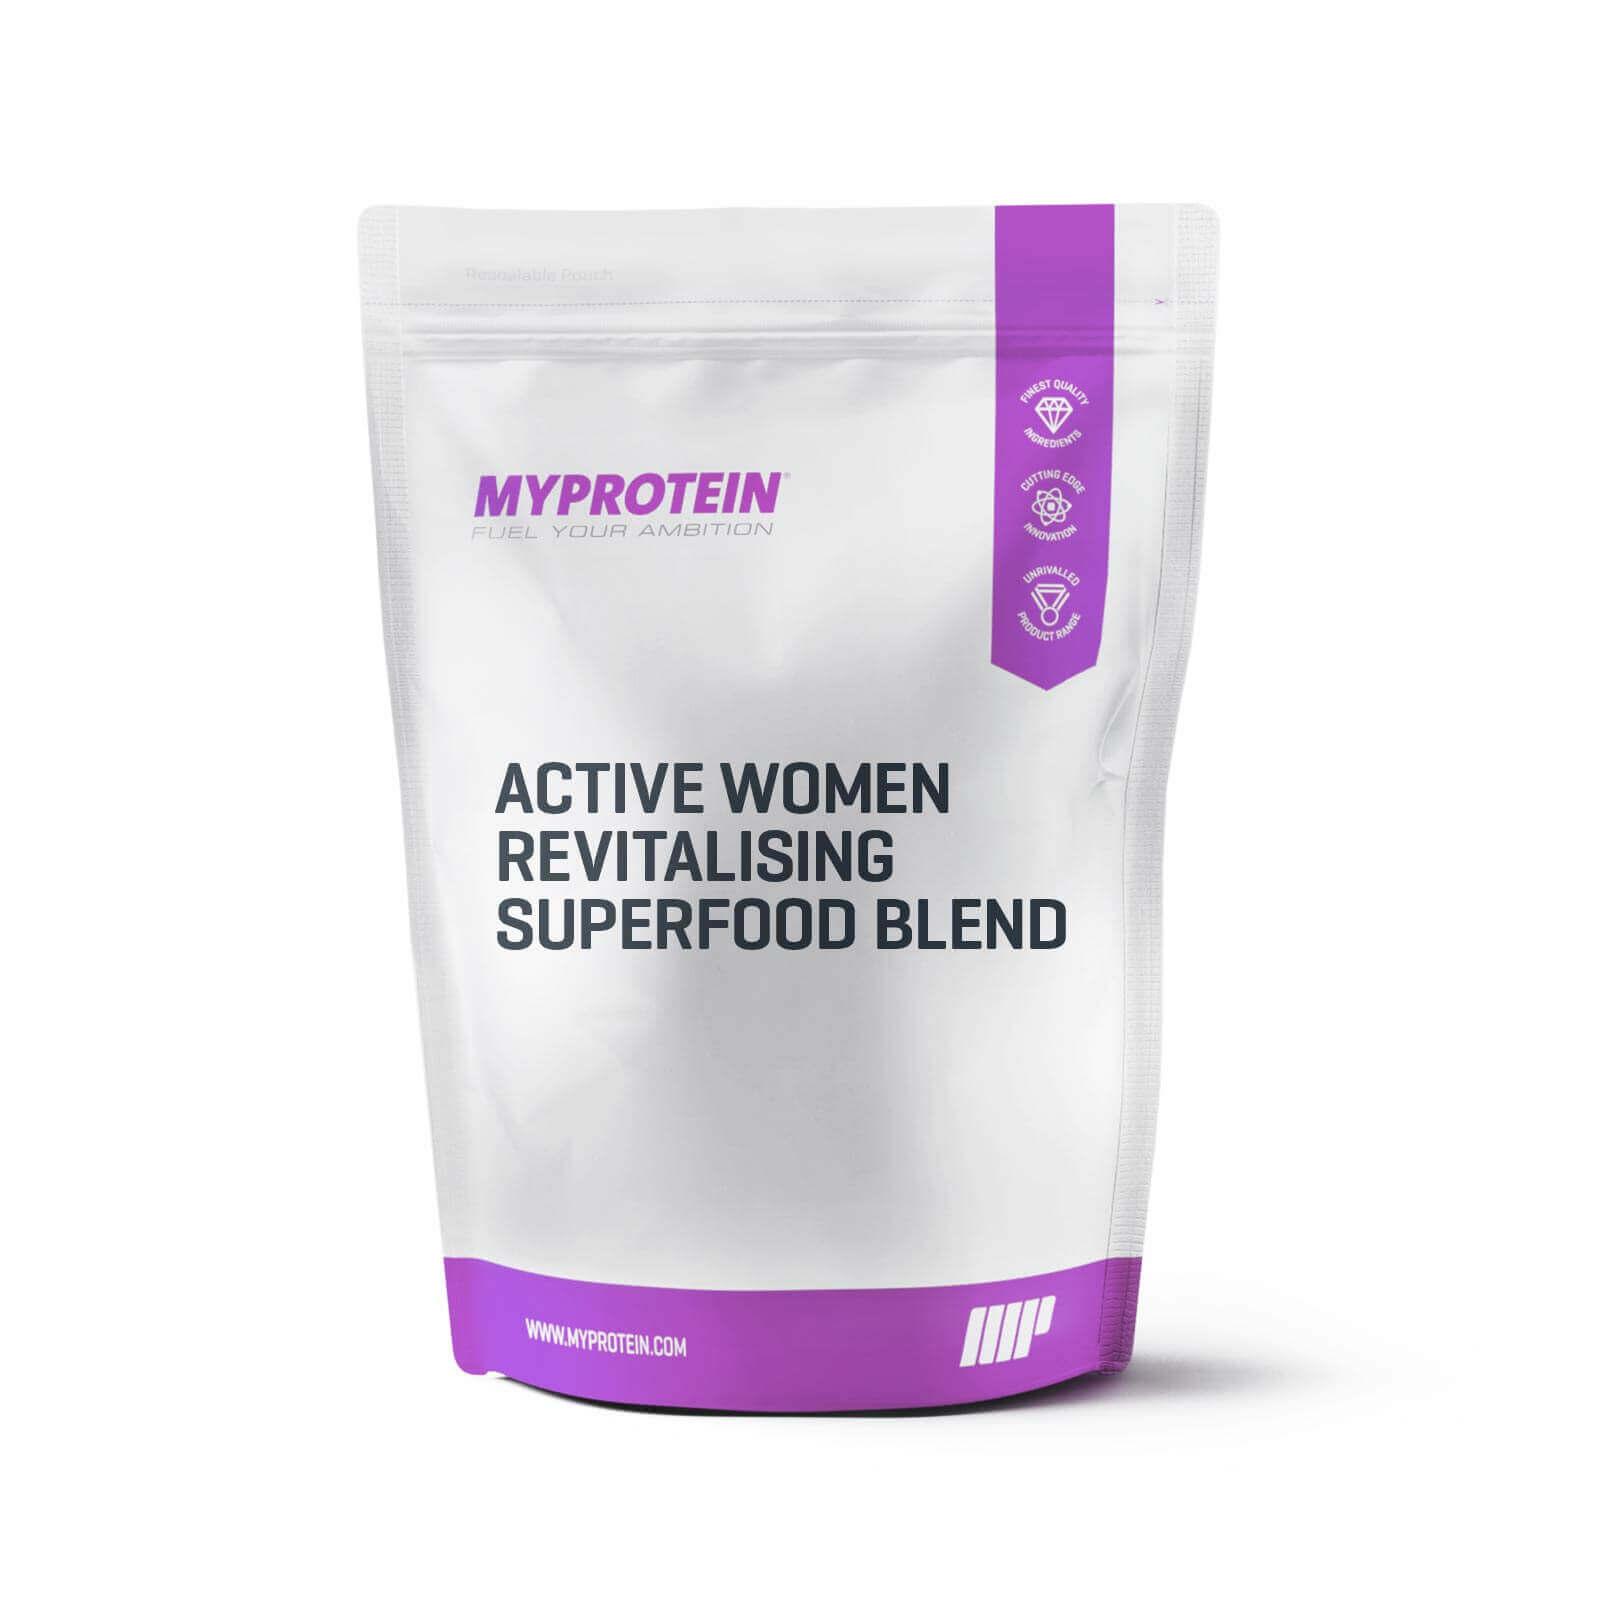 Active Women Revitalising Superfood Blend